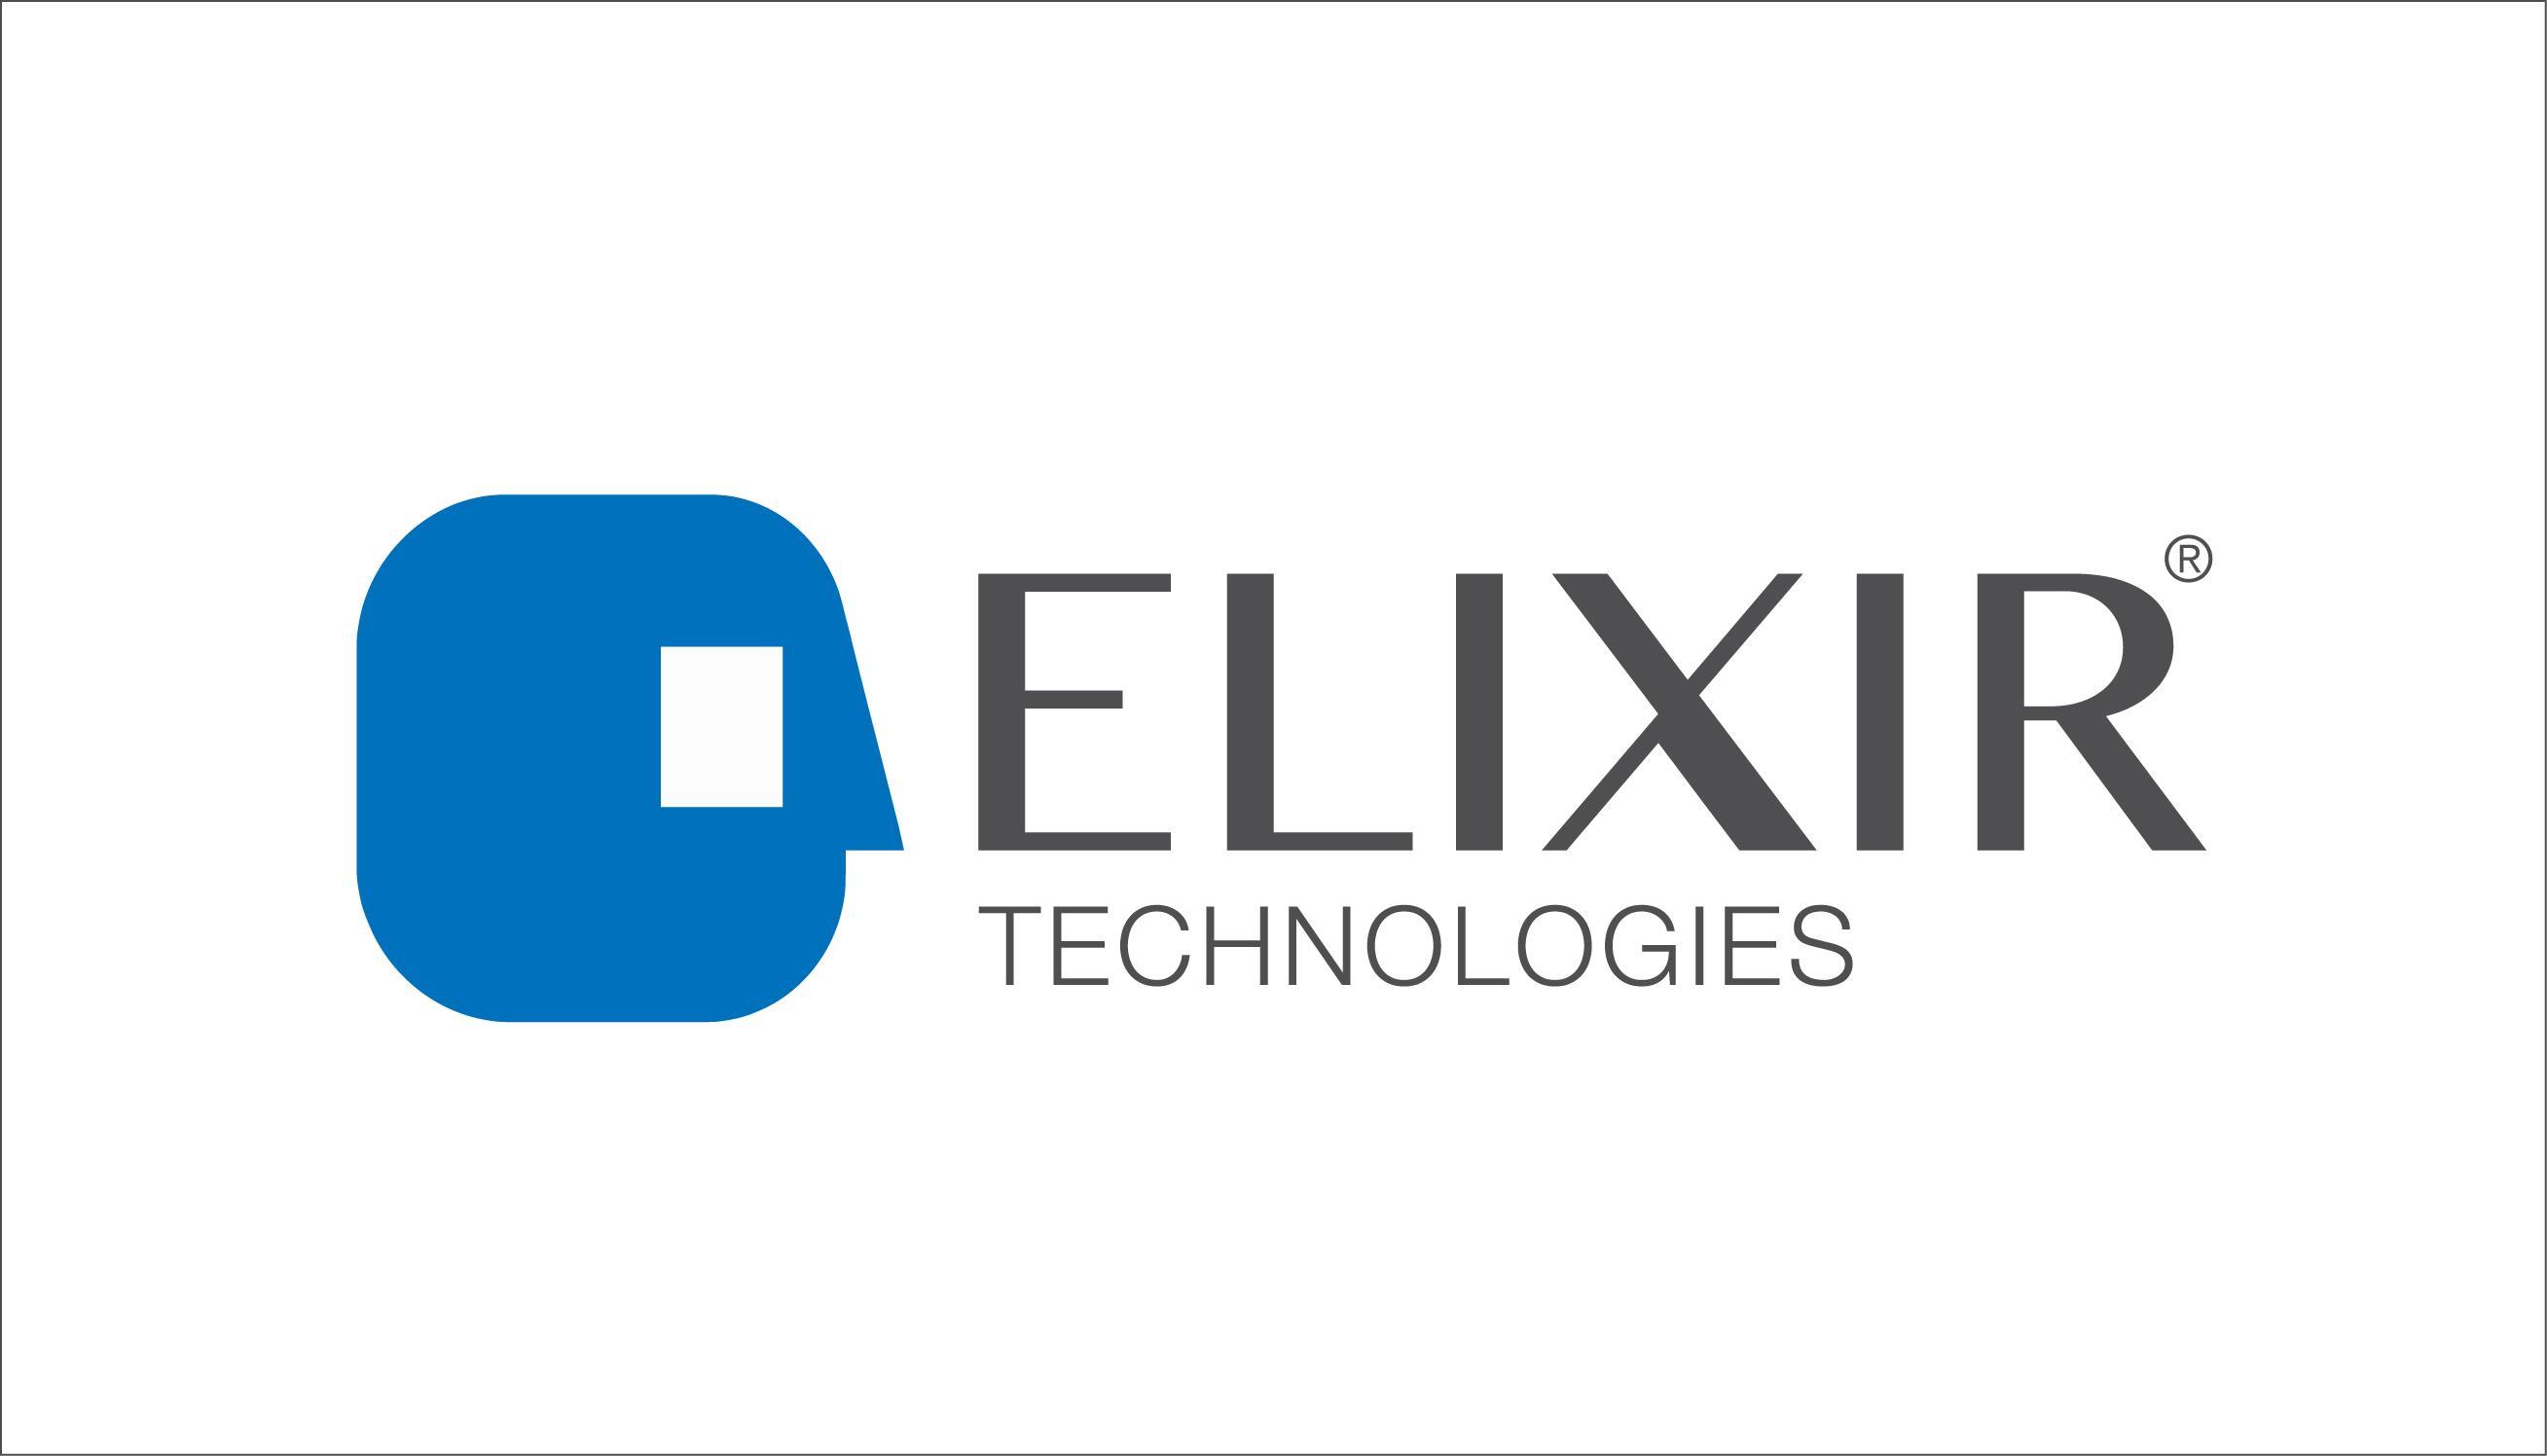 Elixir Technologies